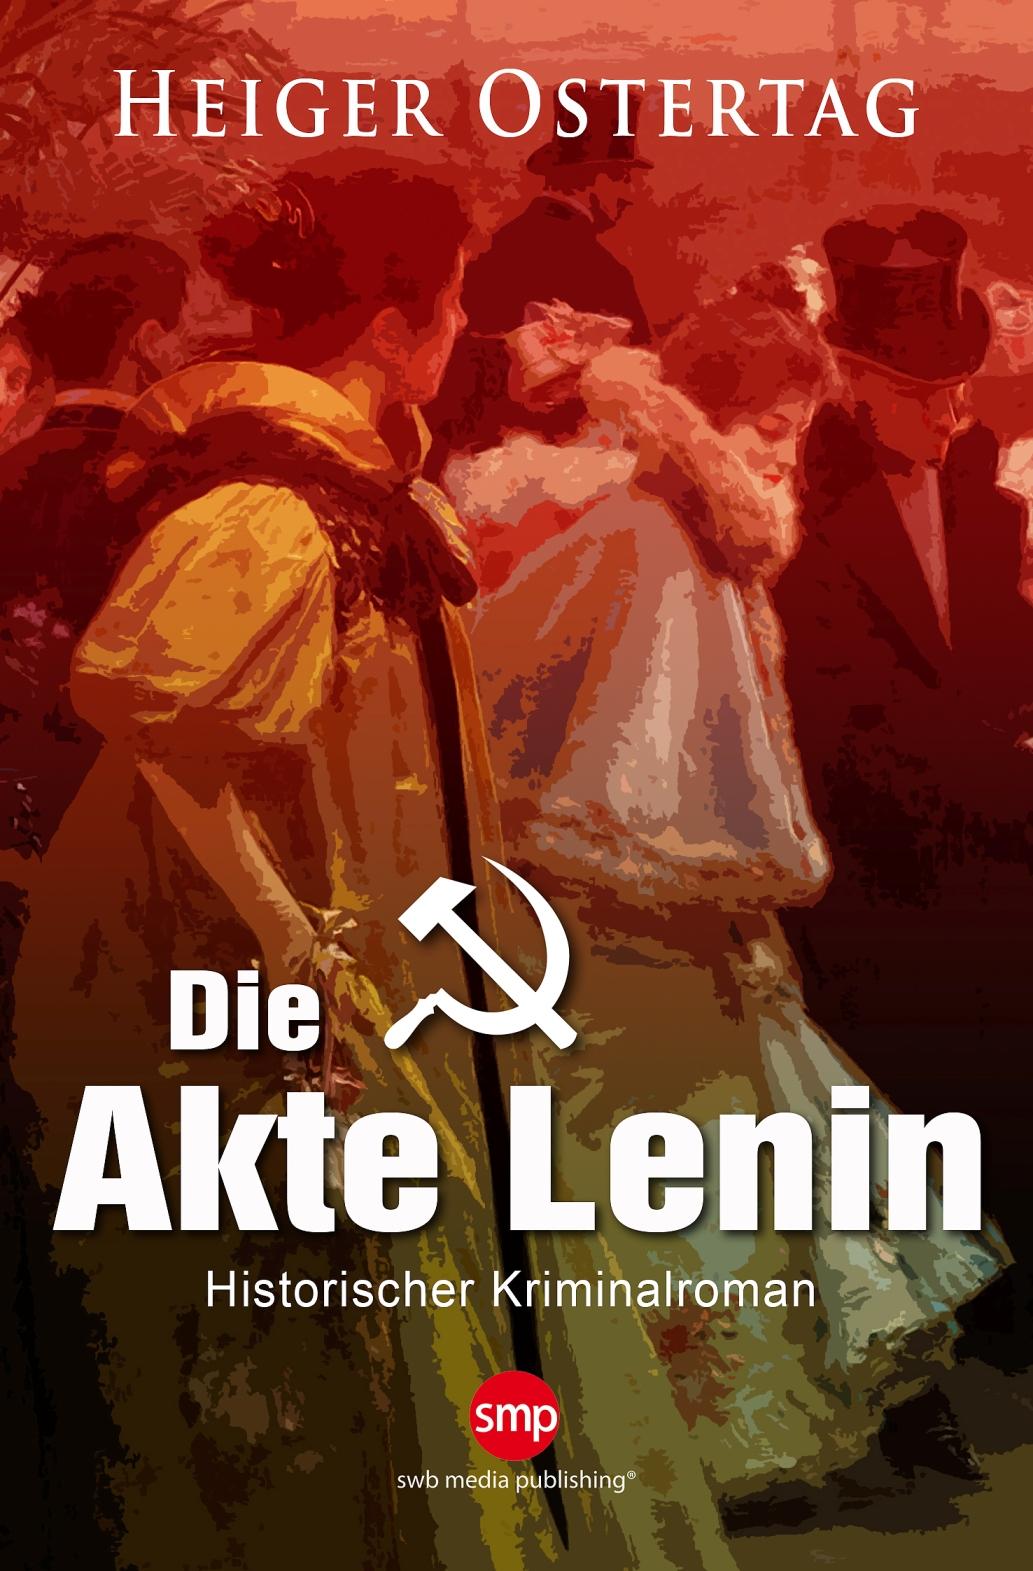 Die Akte Lenin